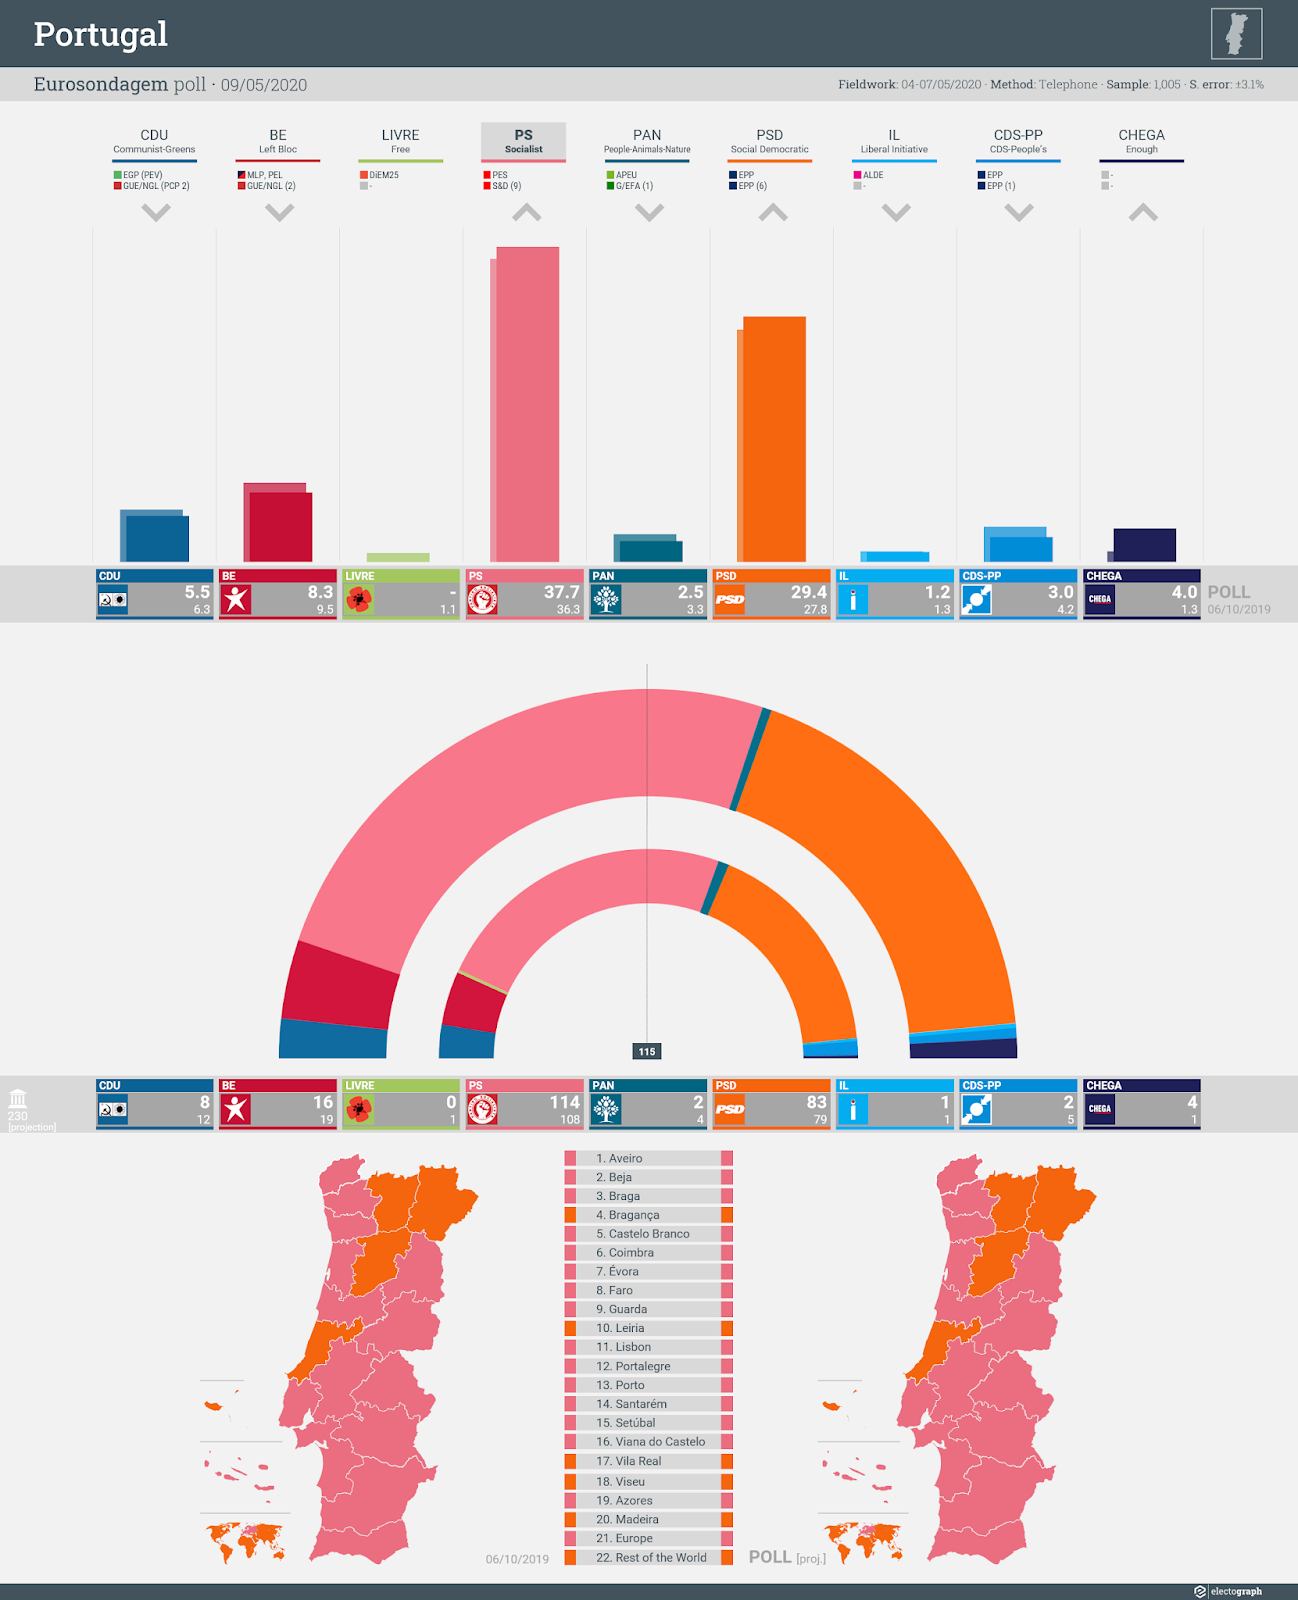 PORTUGAL: Eurosondagem poll chart, 9 May 2020